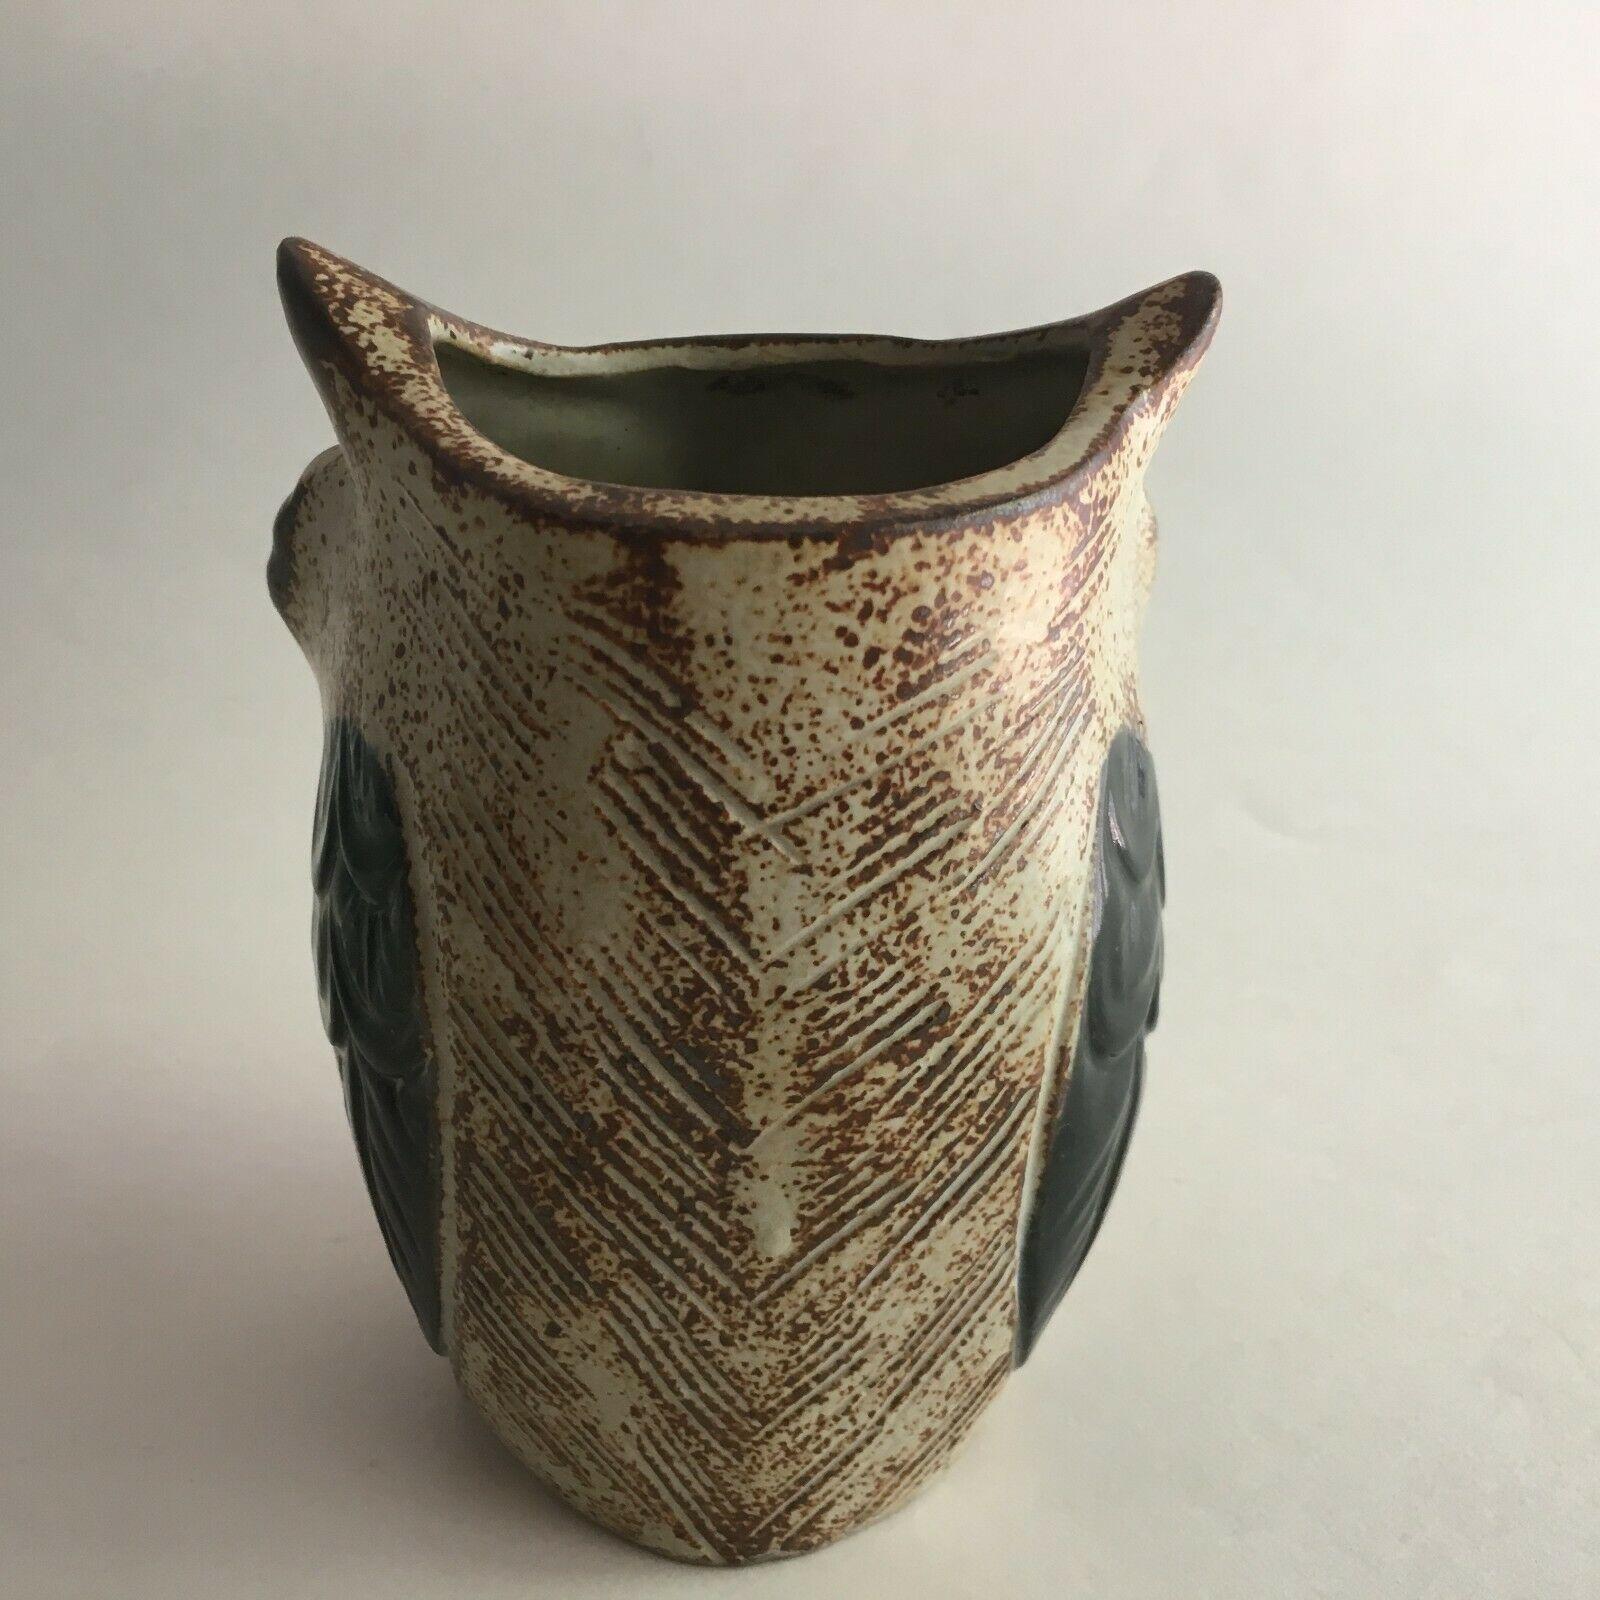 "Vintage Ceramic Owl Flower Vase Figurine 5.5"" X 3"" Brown & Cream Big Black Eyes image 2"